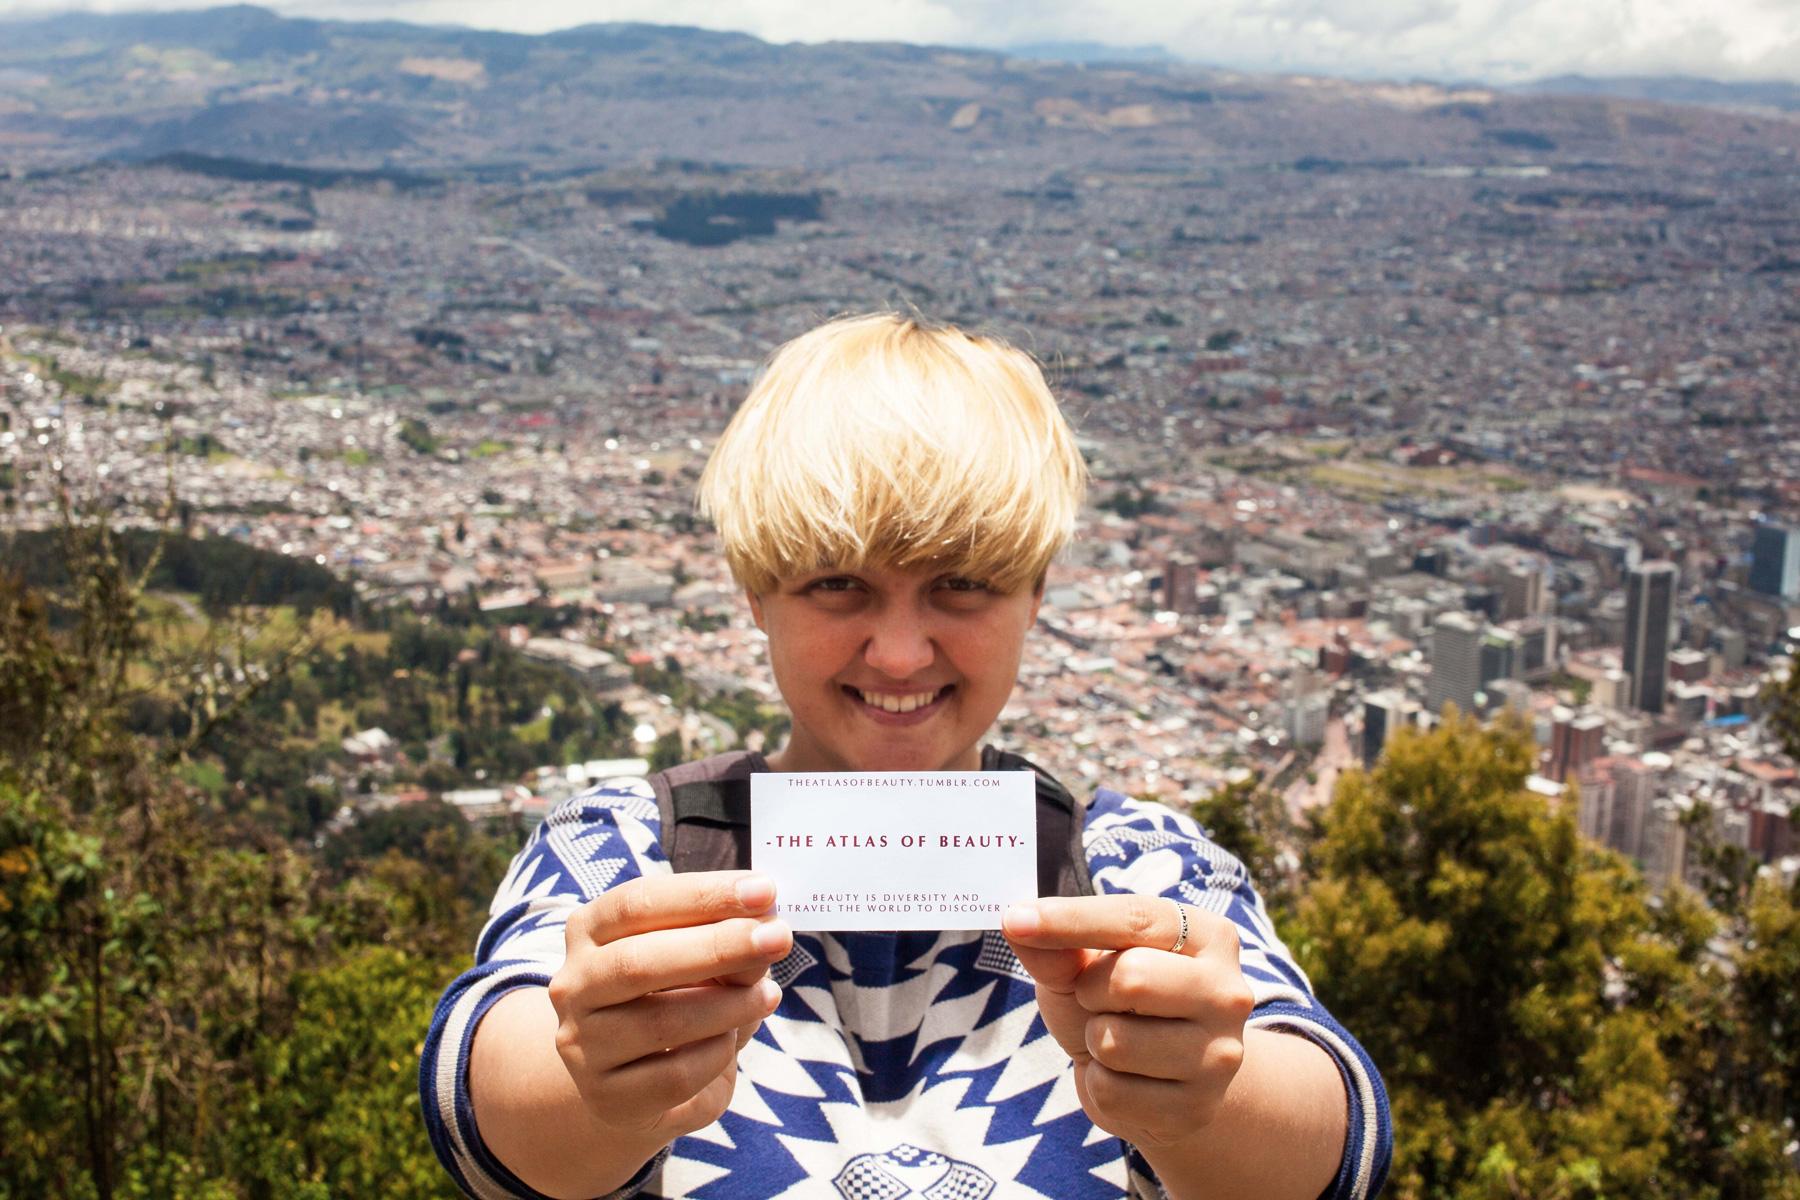 Mihaela-Noroc-Atlas-of-Beauty-me-in-Bogota